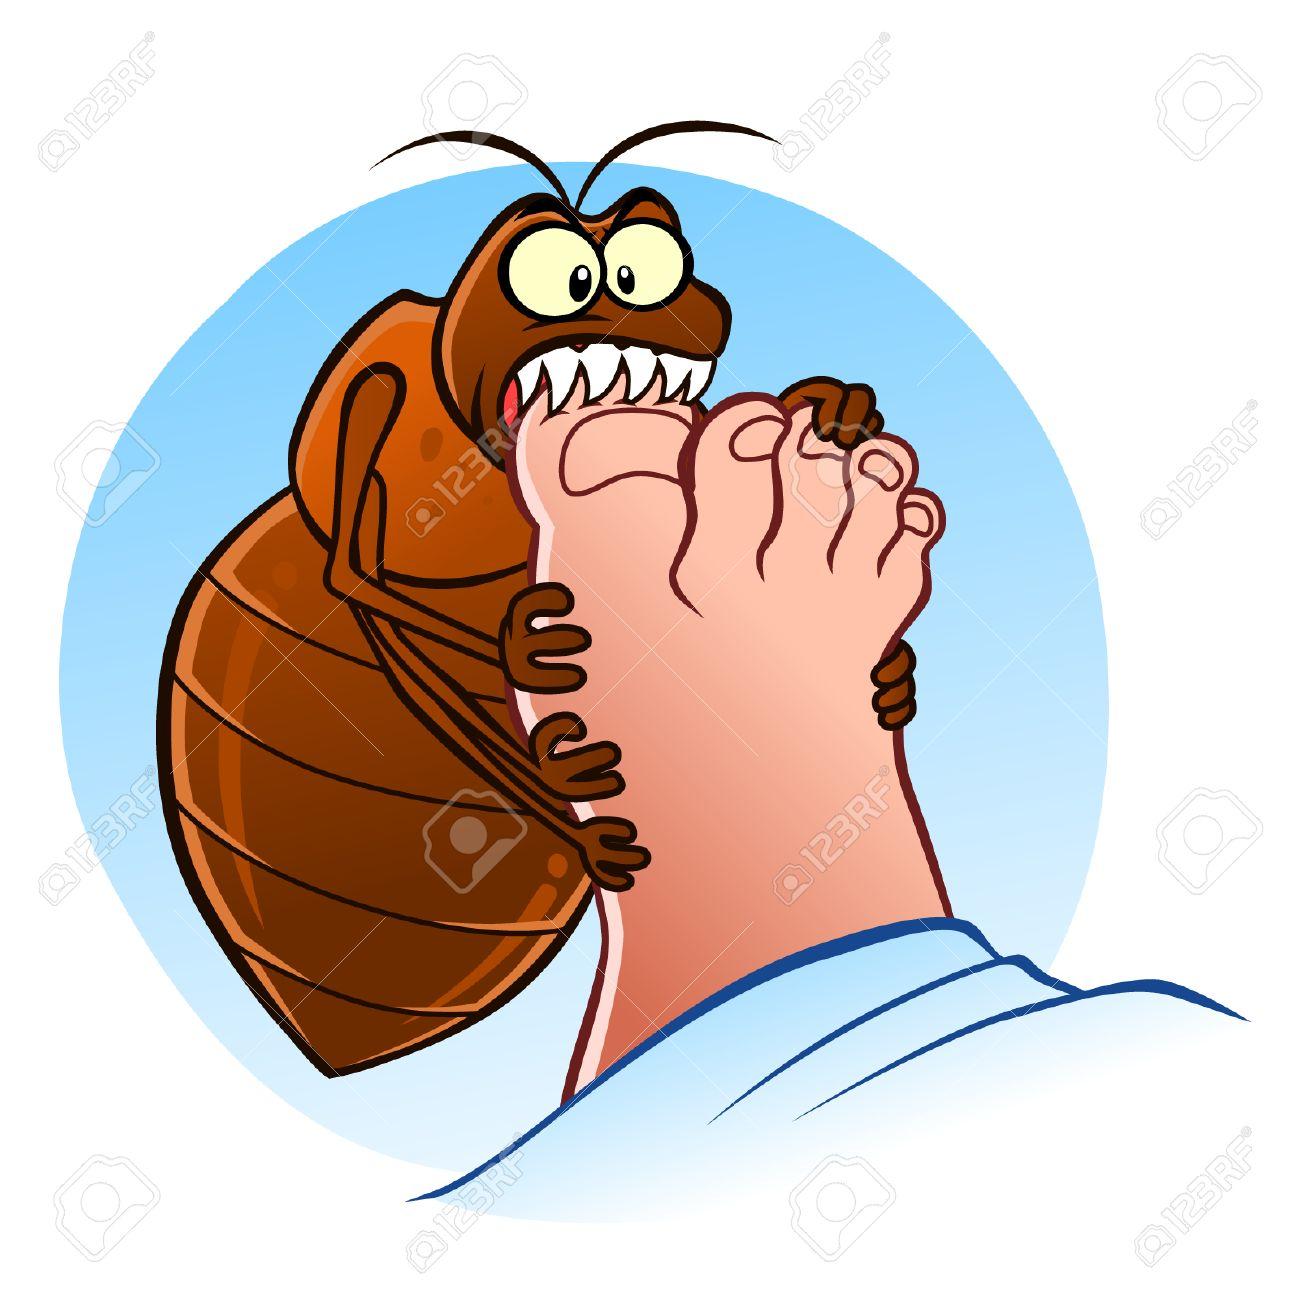 Bedbug bites - 39645634